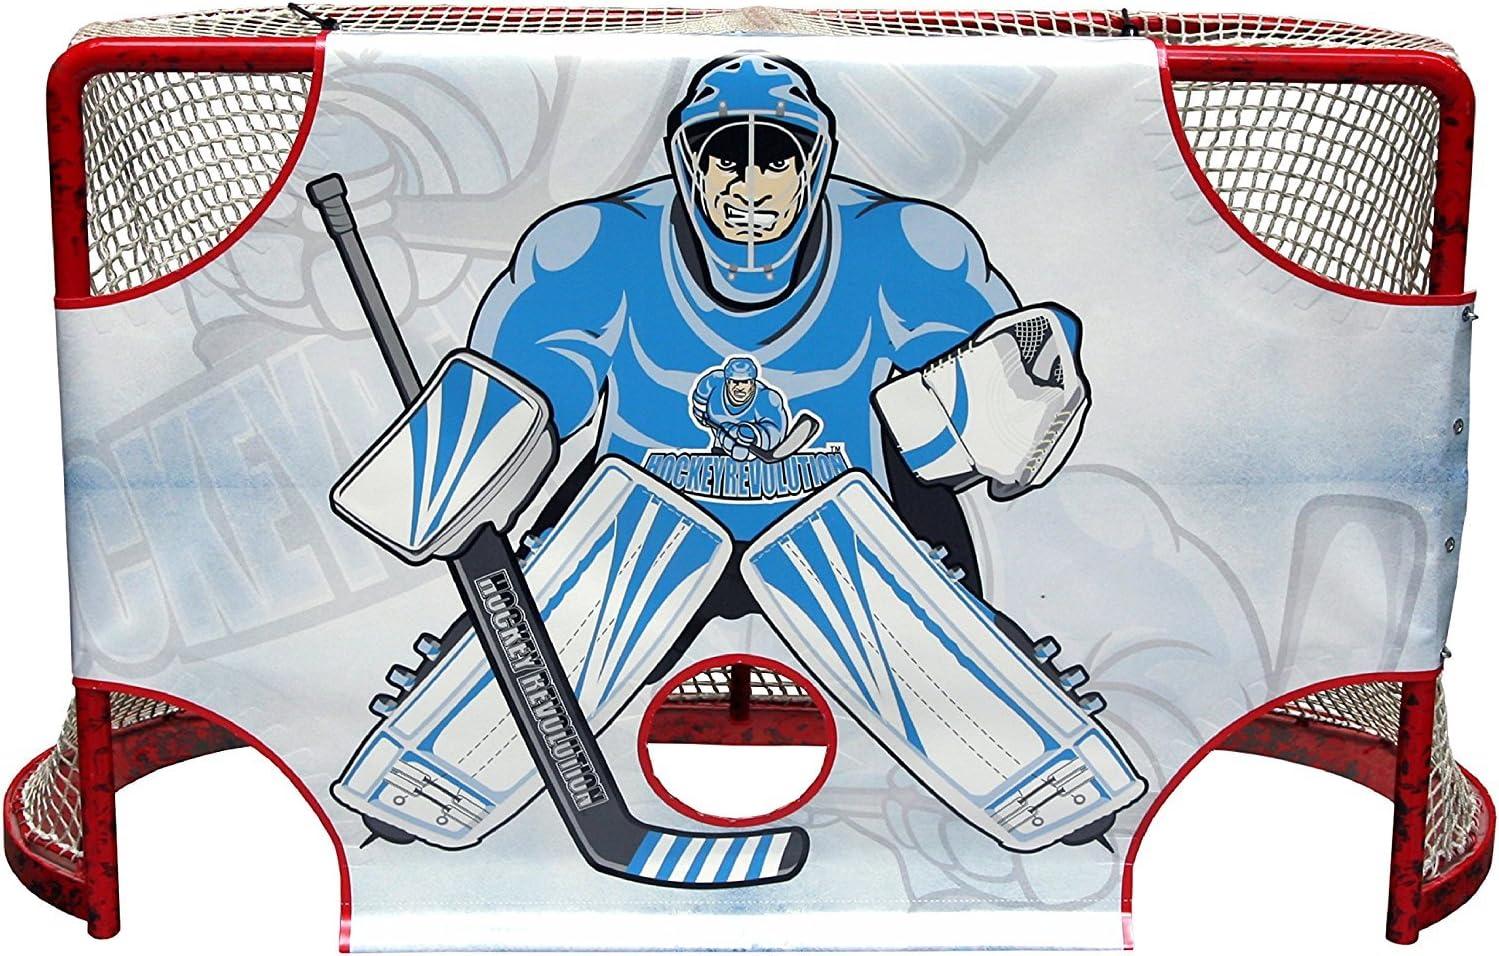 (MY GOALIE TARGET) - Hockey Revolution Goal Targets Sharp Shooting Training Aid